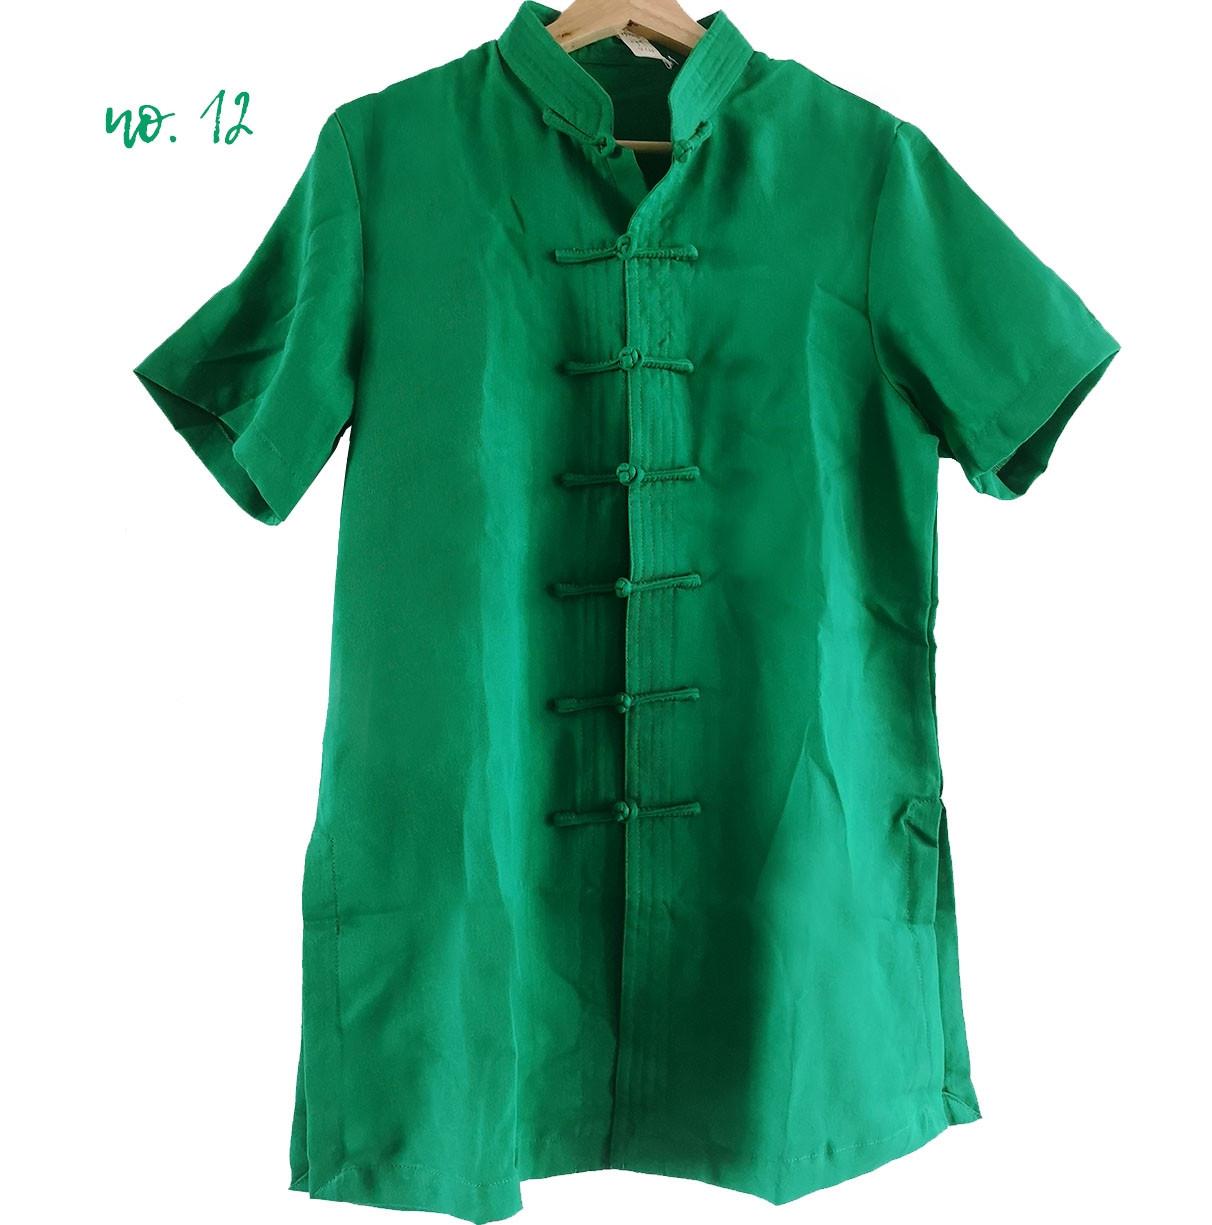 [DESTOCK] Veste manches courtes Tai Chi / Chang Quan Kung Fu en lin 165cm vert